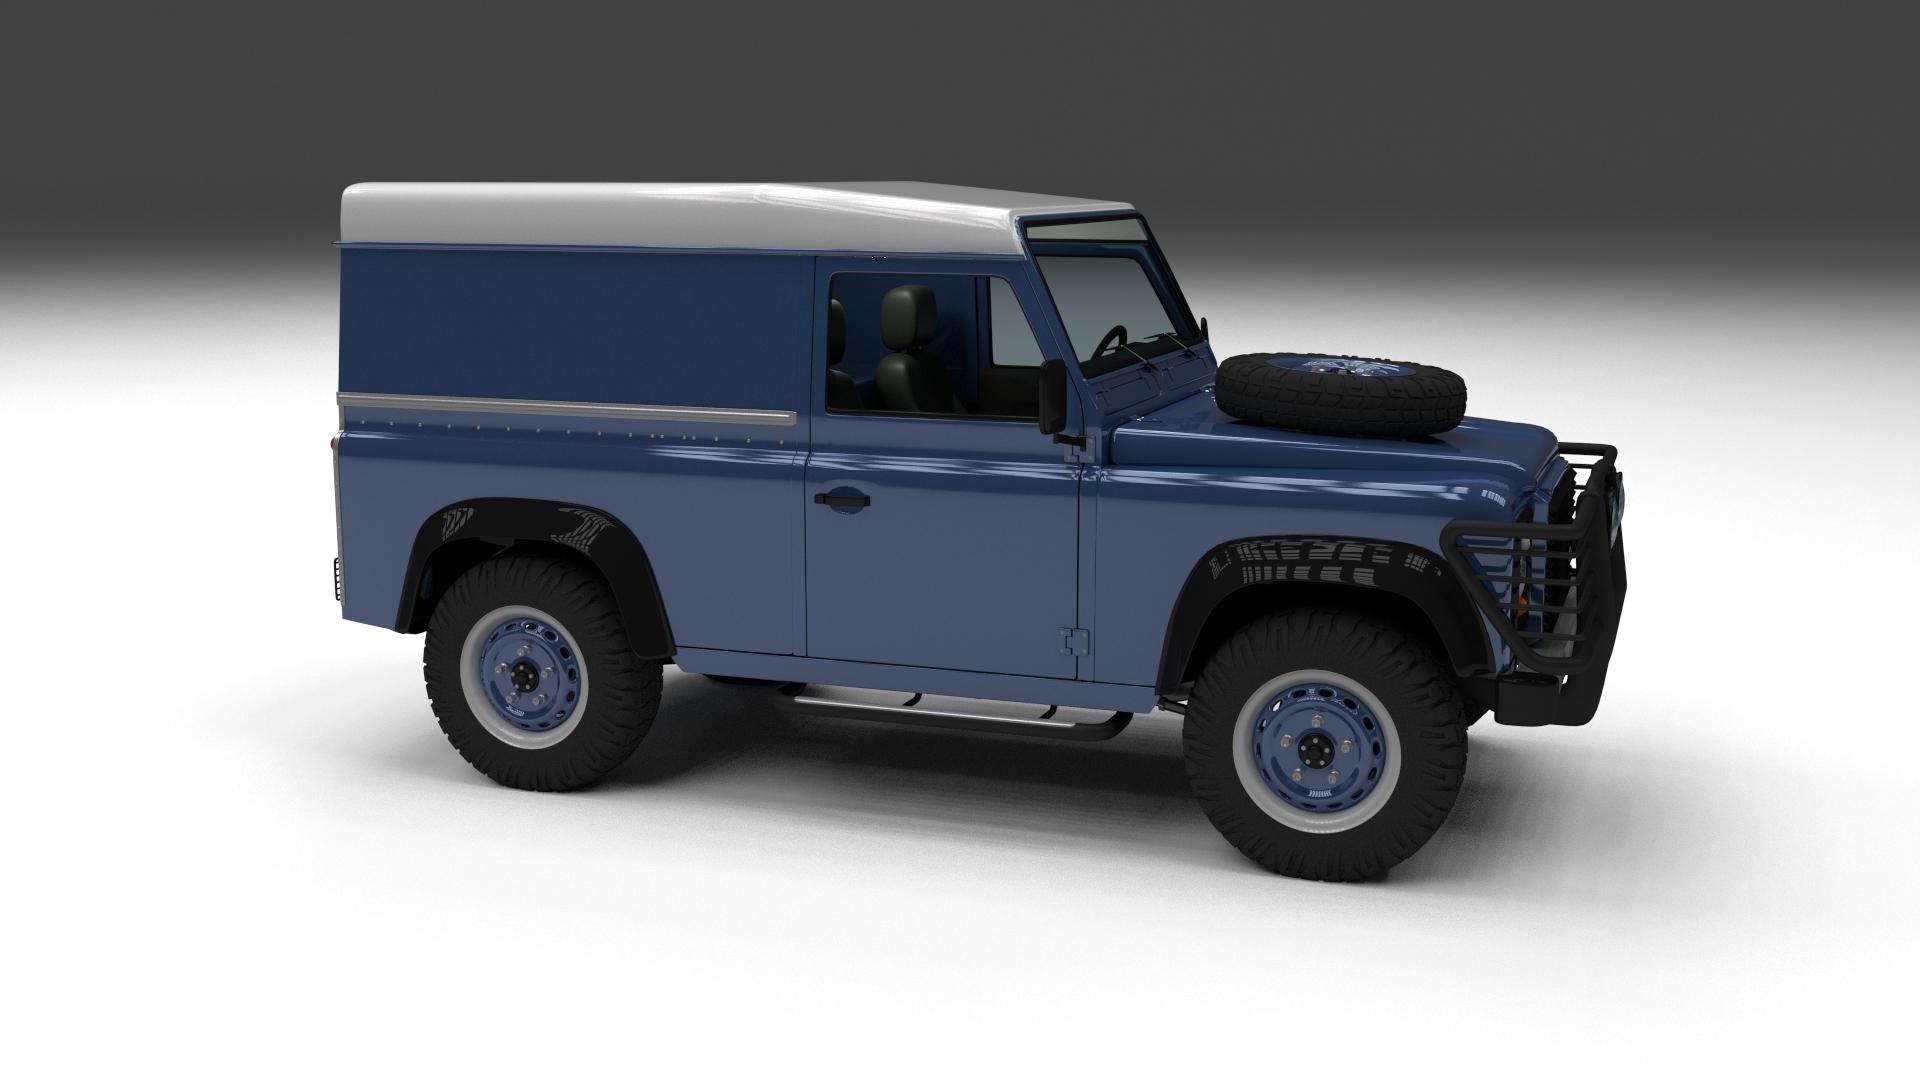 Full Land Rover Defender 90 Hard Top HDRI by dragosburian